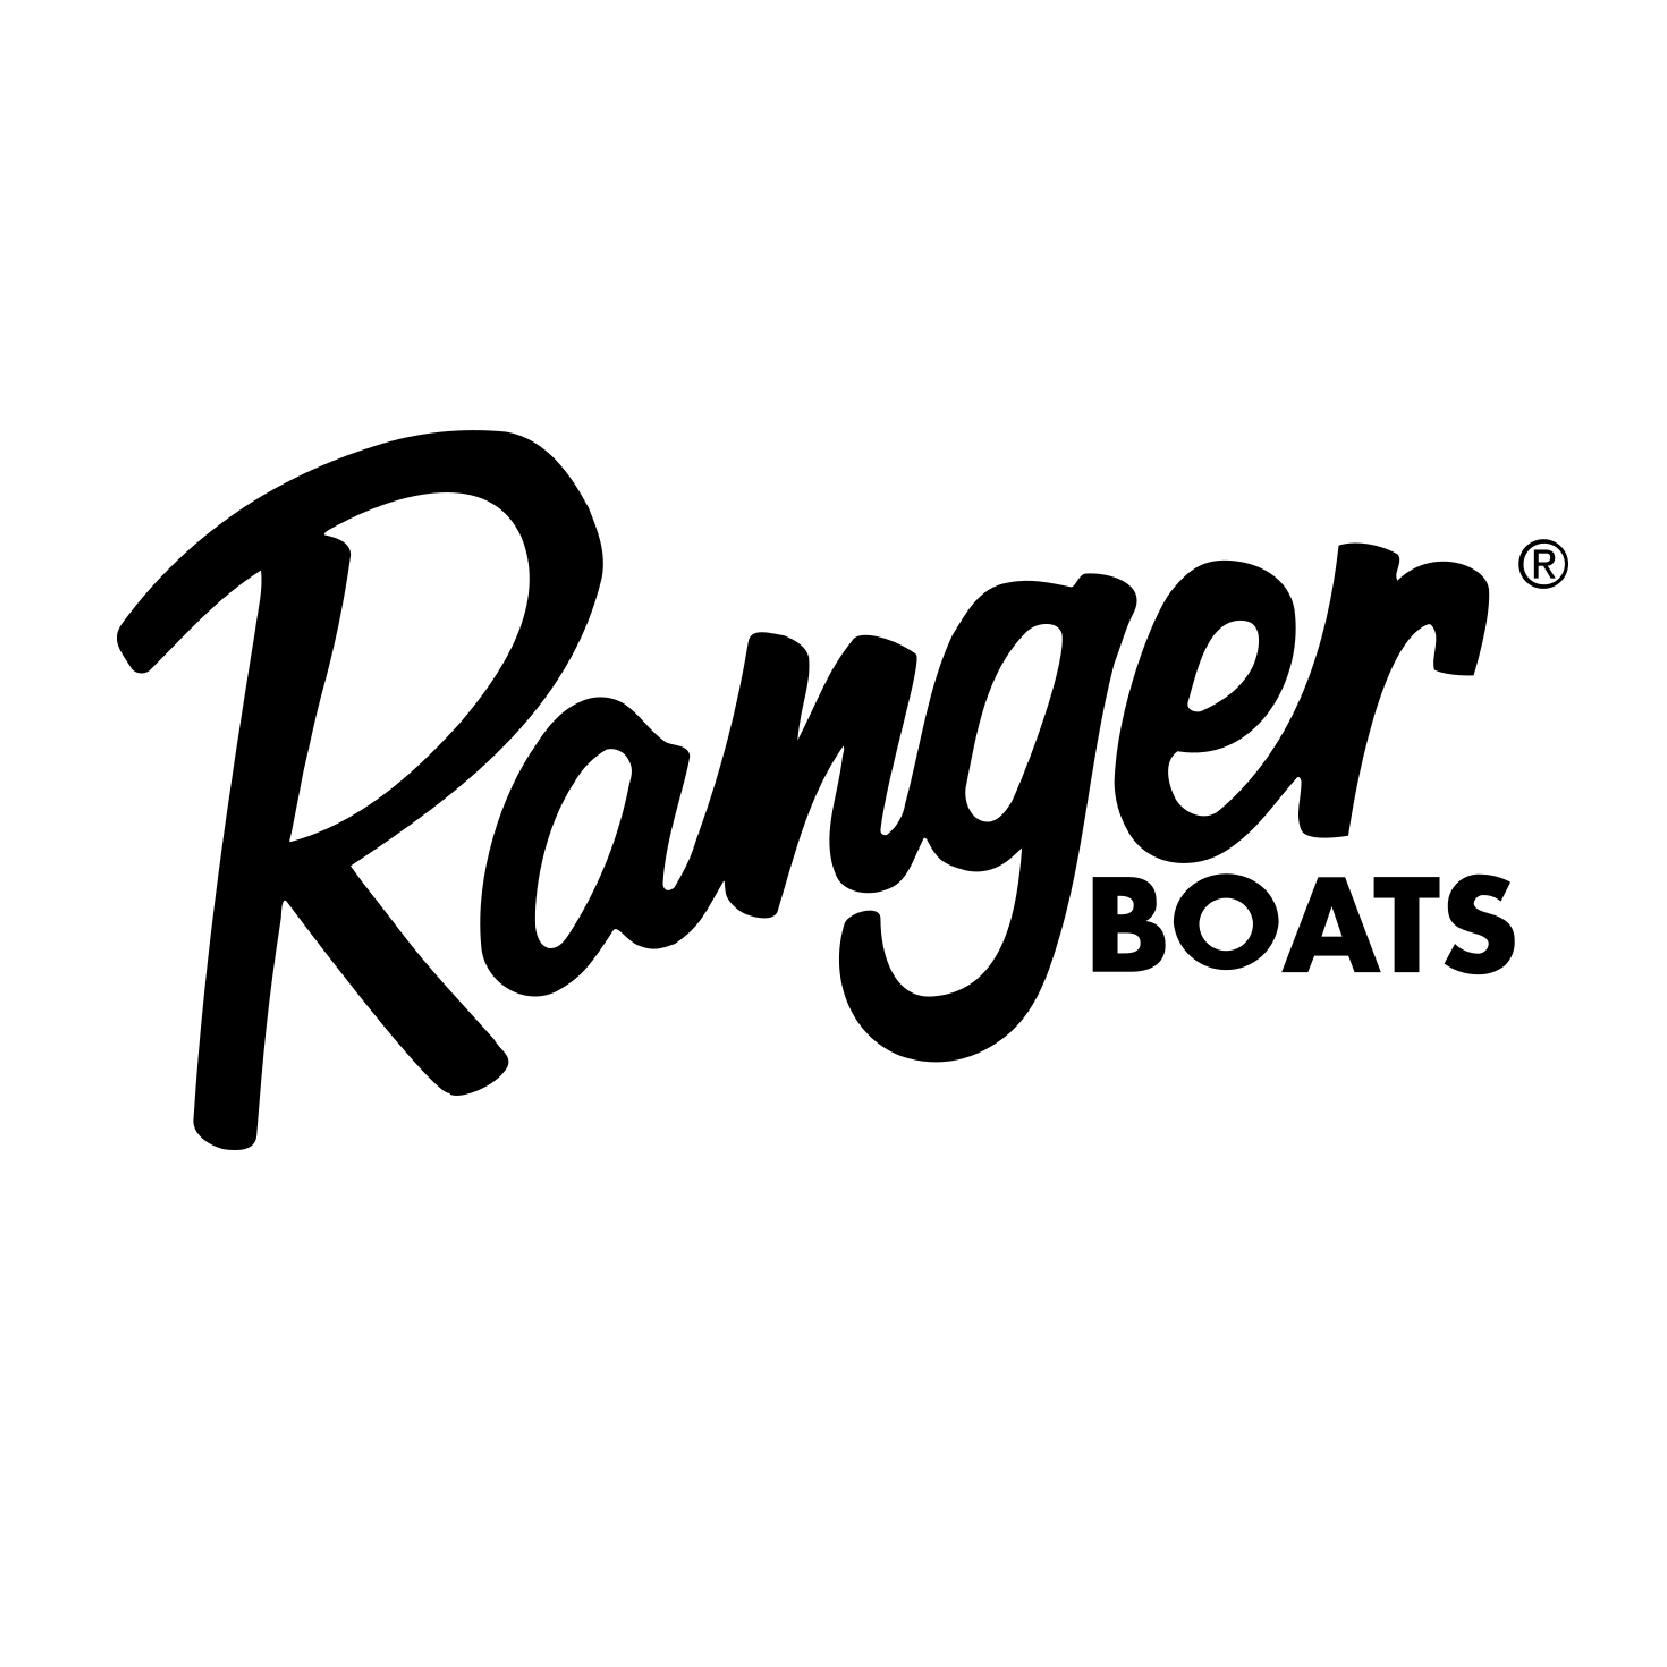 Ranger Boats Square